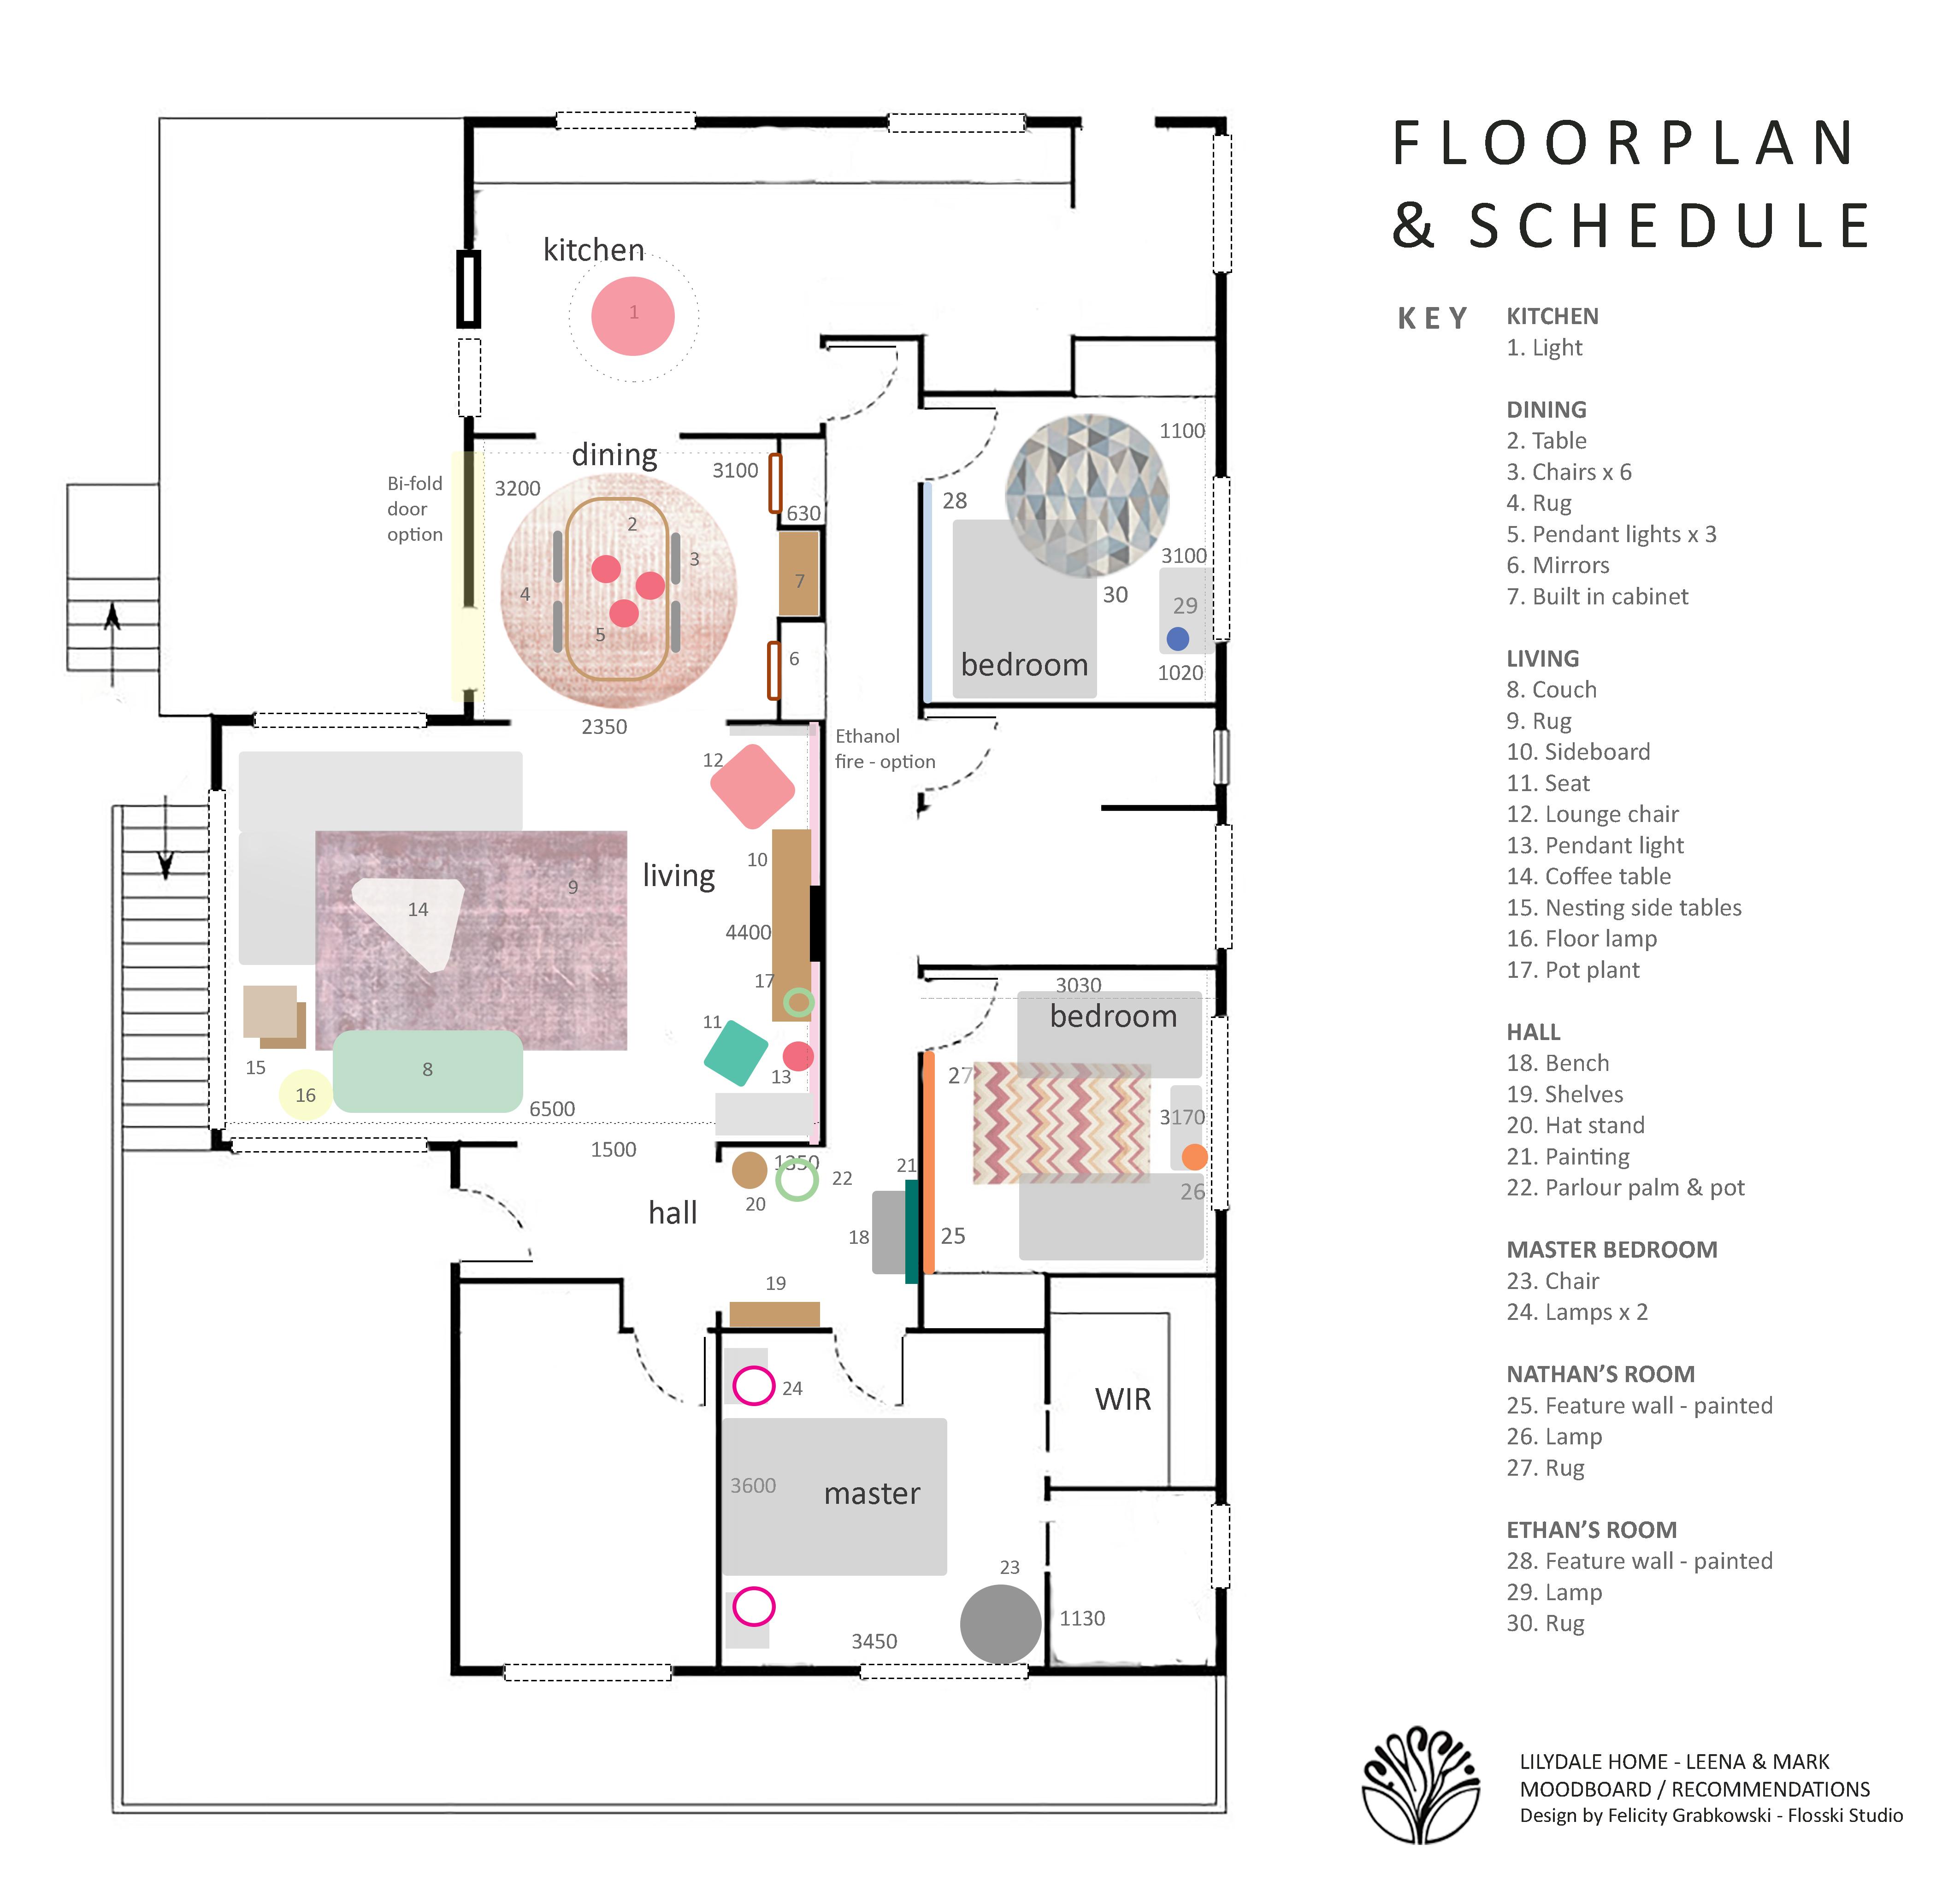 Lilydale interior - Plan and schedule -